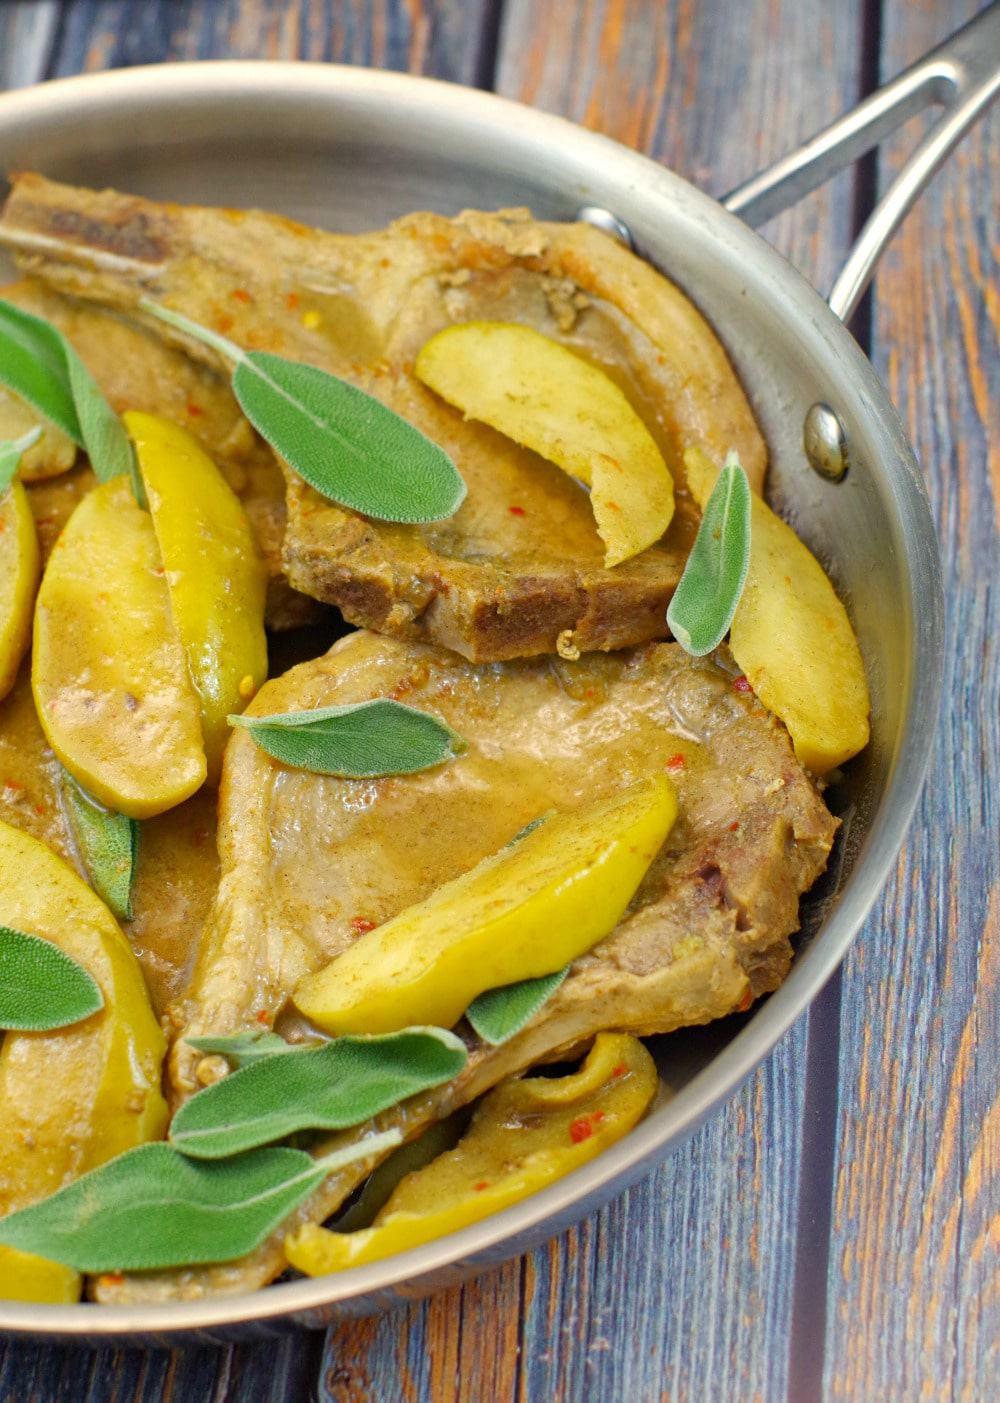 Pork Chops with apple sage sauce